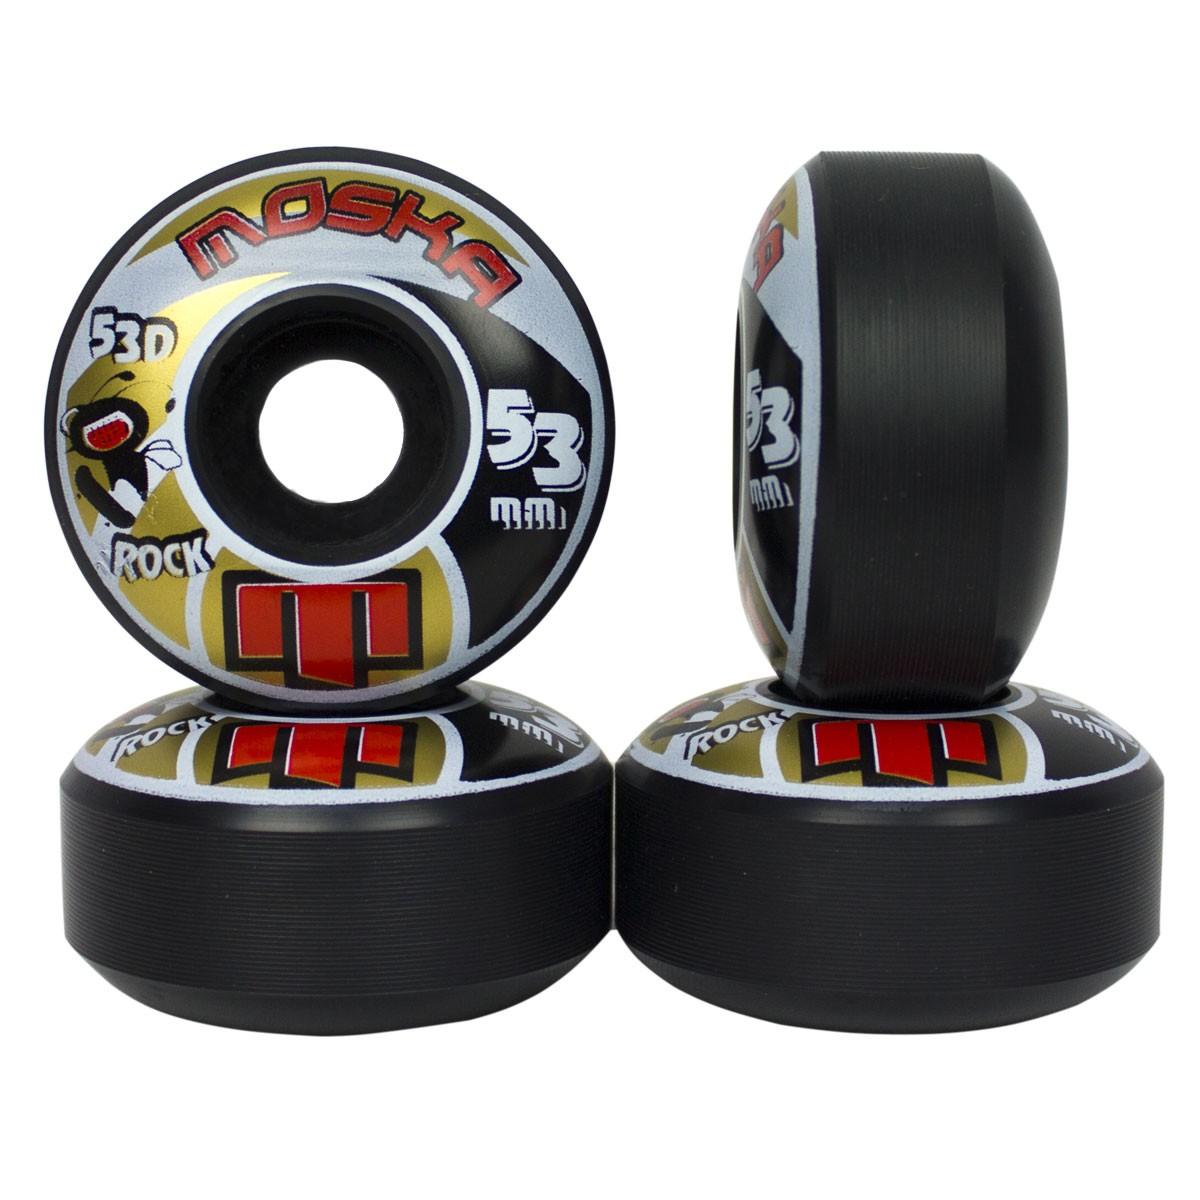 Roda Skate Moska Skate 53mm 53D 101A de Dureza